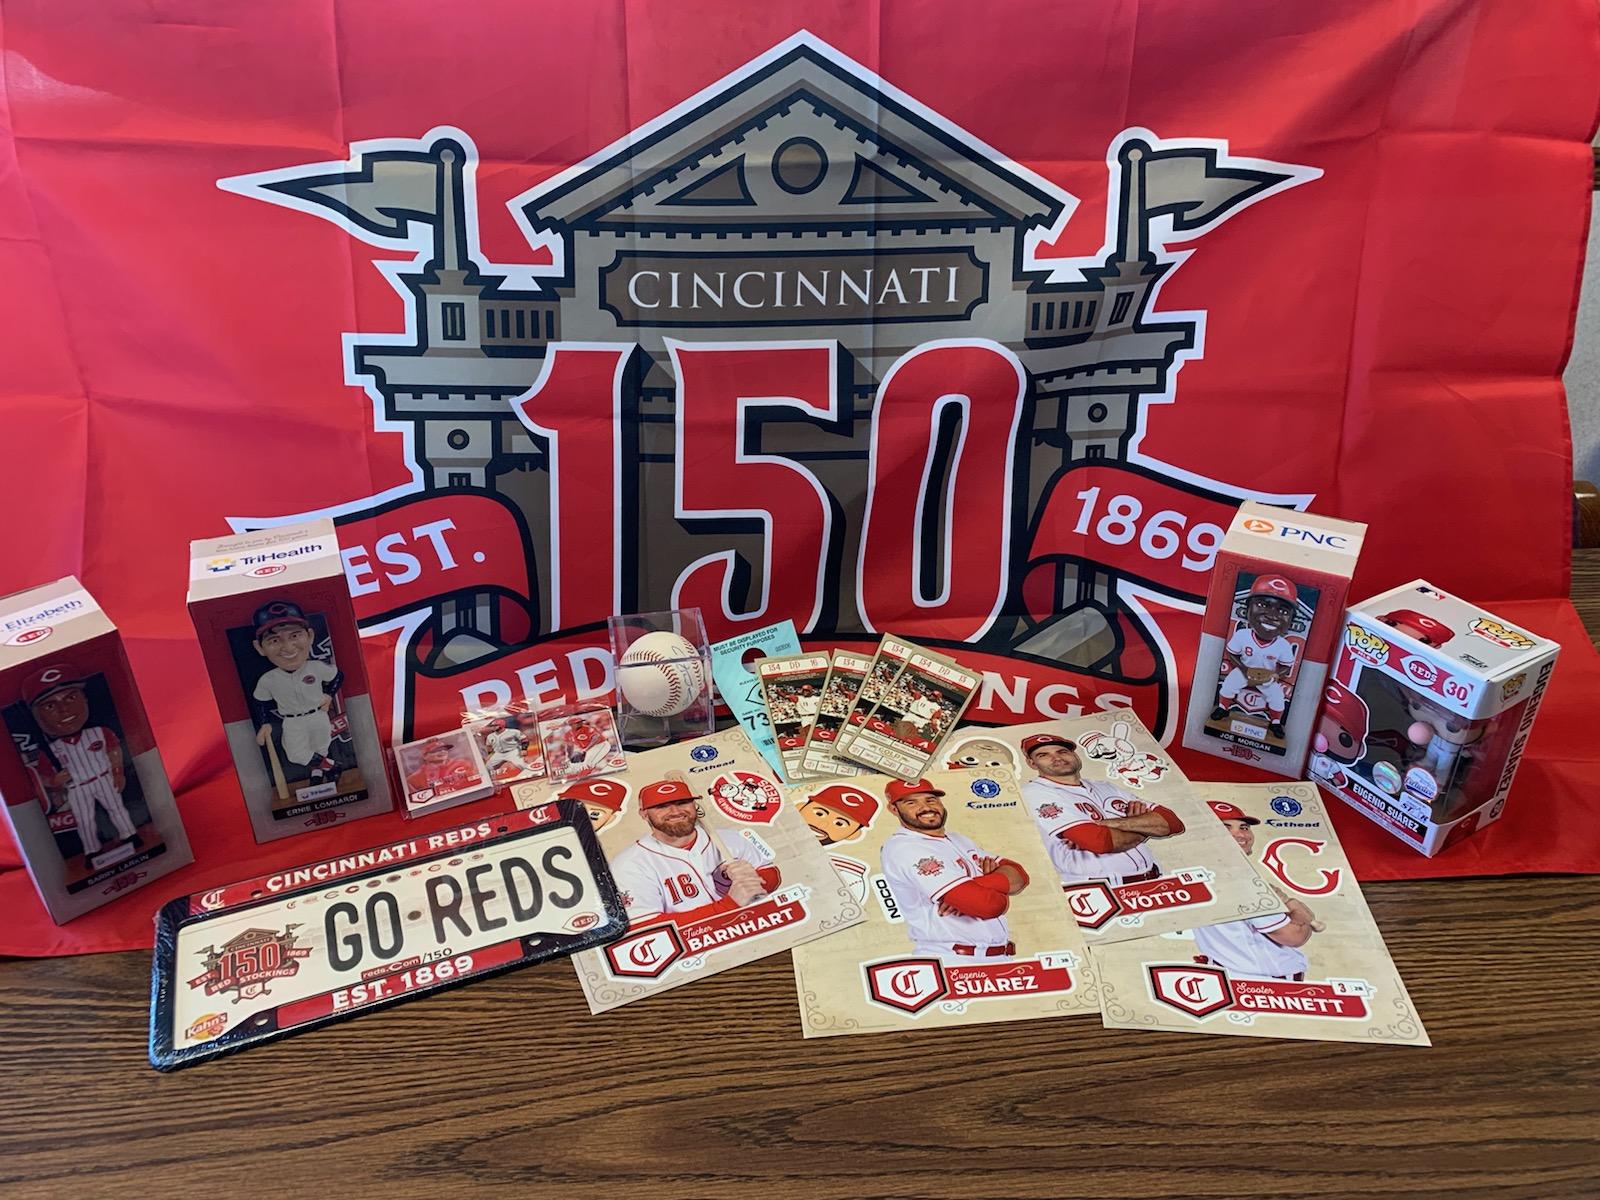 Cincinnati Reds package for Dayton Fundraiser 2019